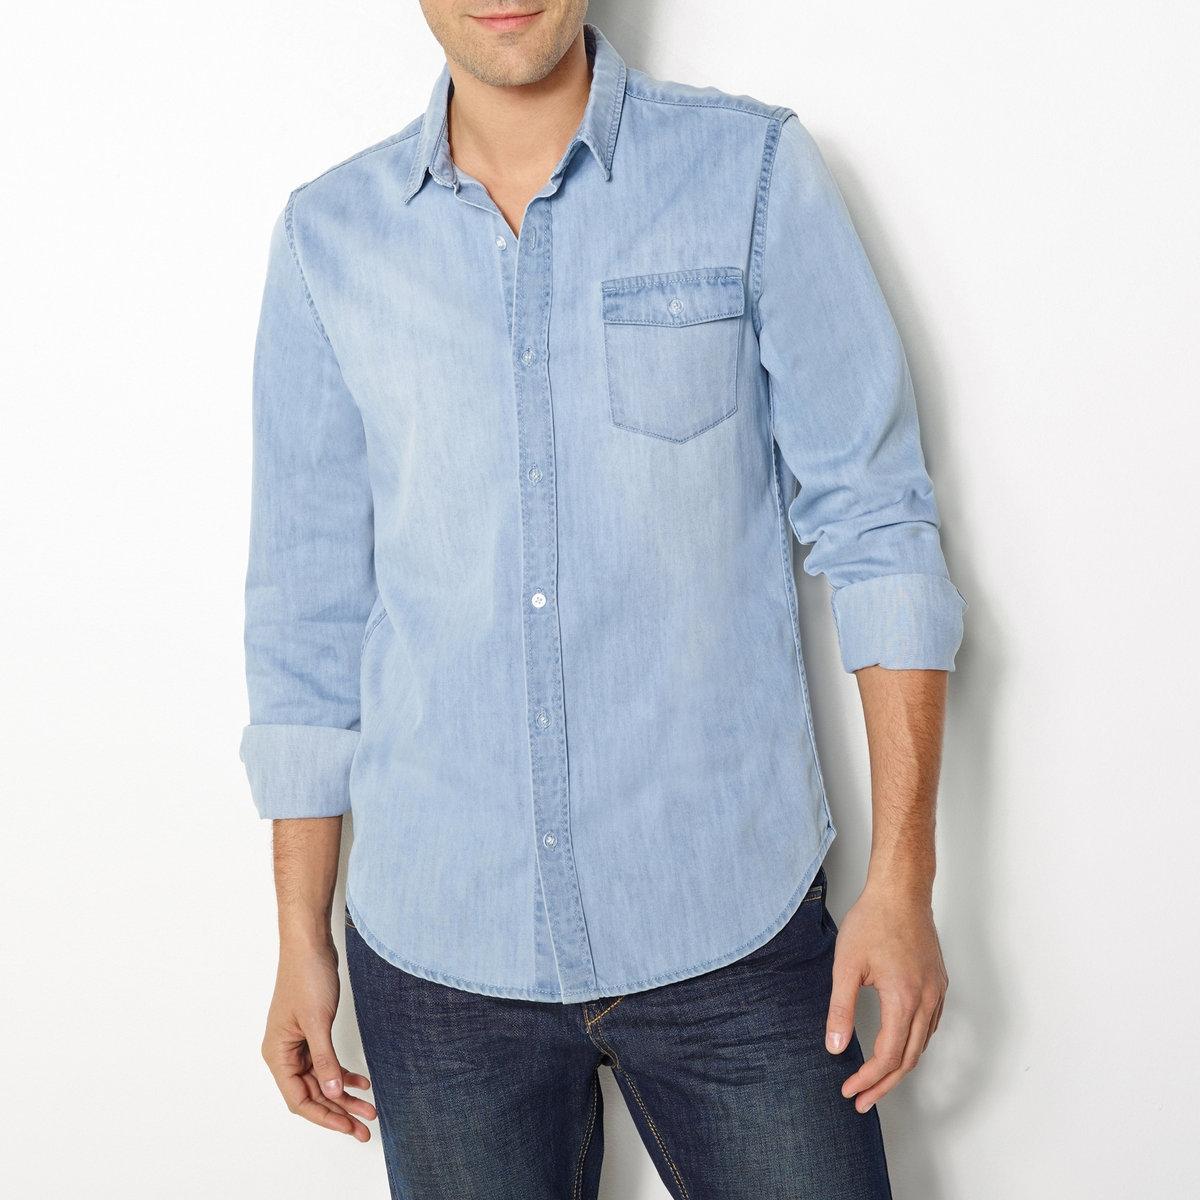 Рубашка узкая из денима, 100% хлопка